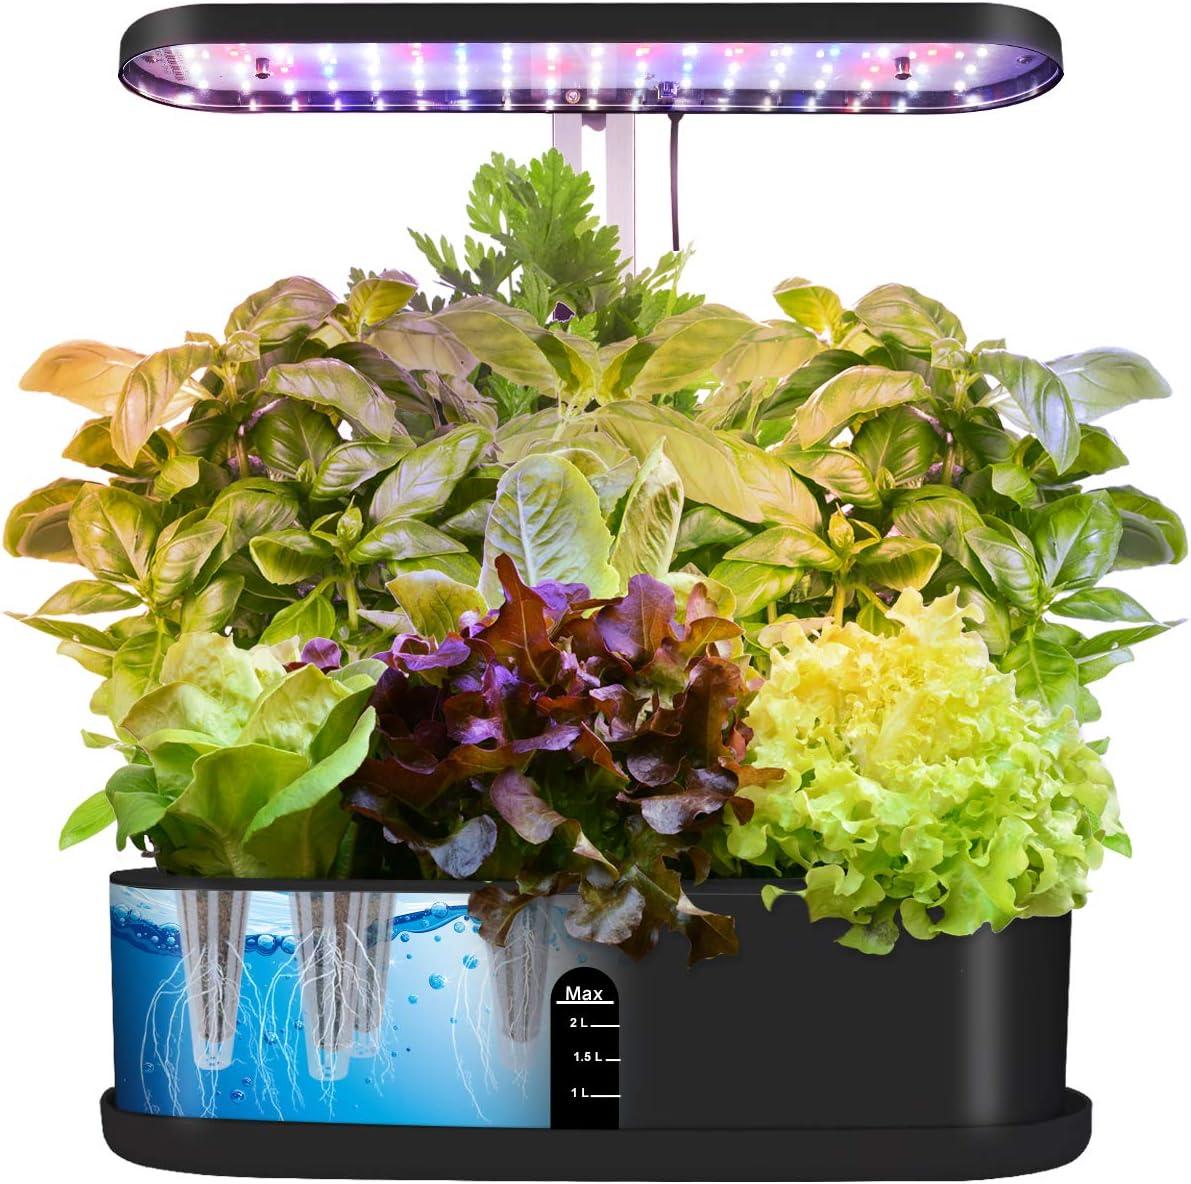 10 New York Mall Pods Hydroponics Growing System Herb Garden Indoor shopping Germinati